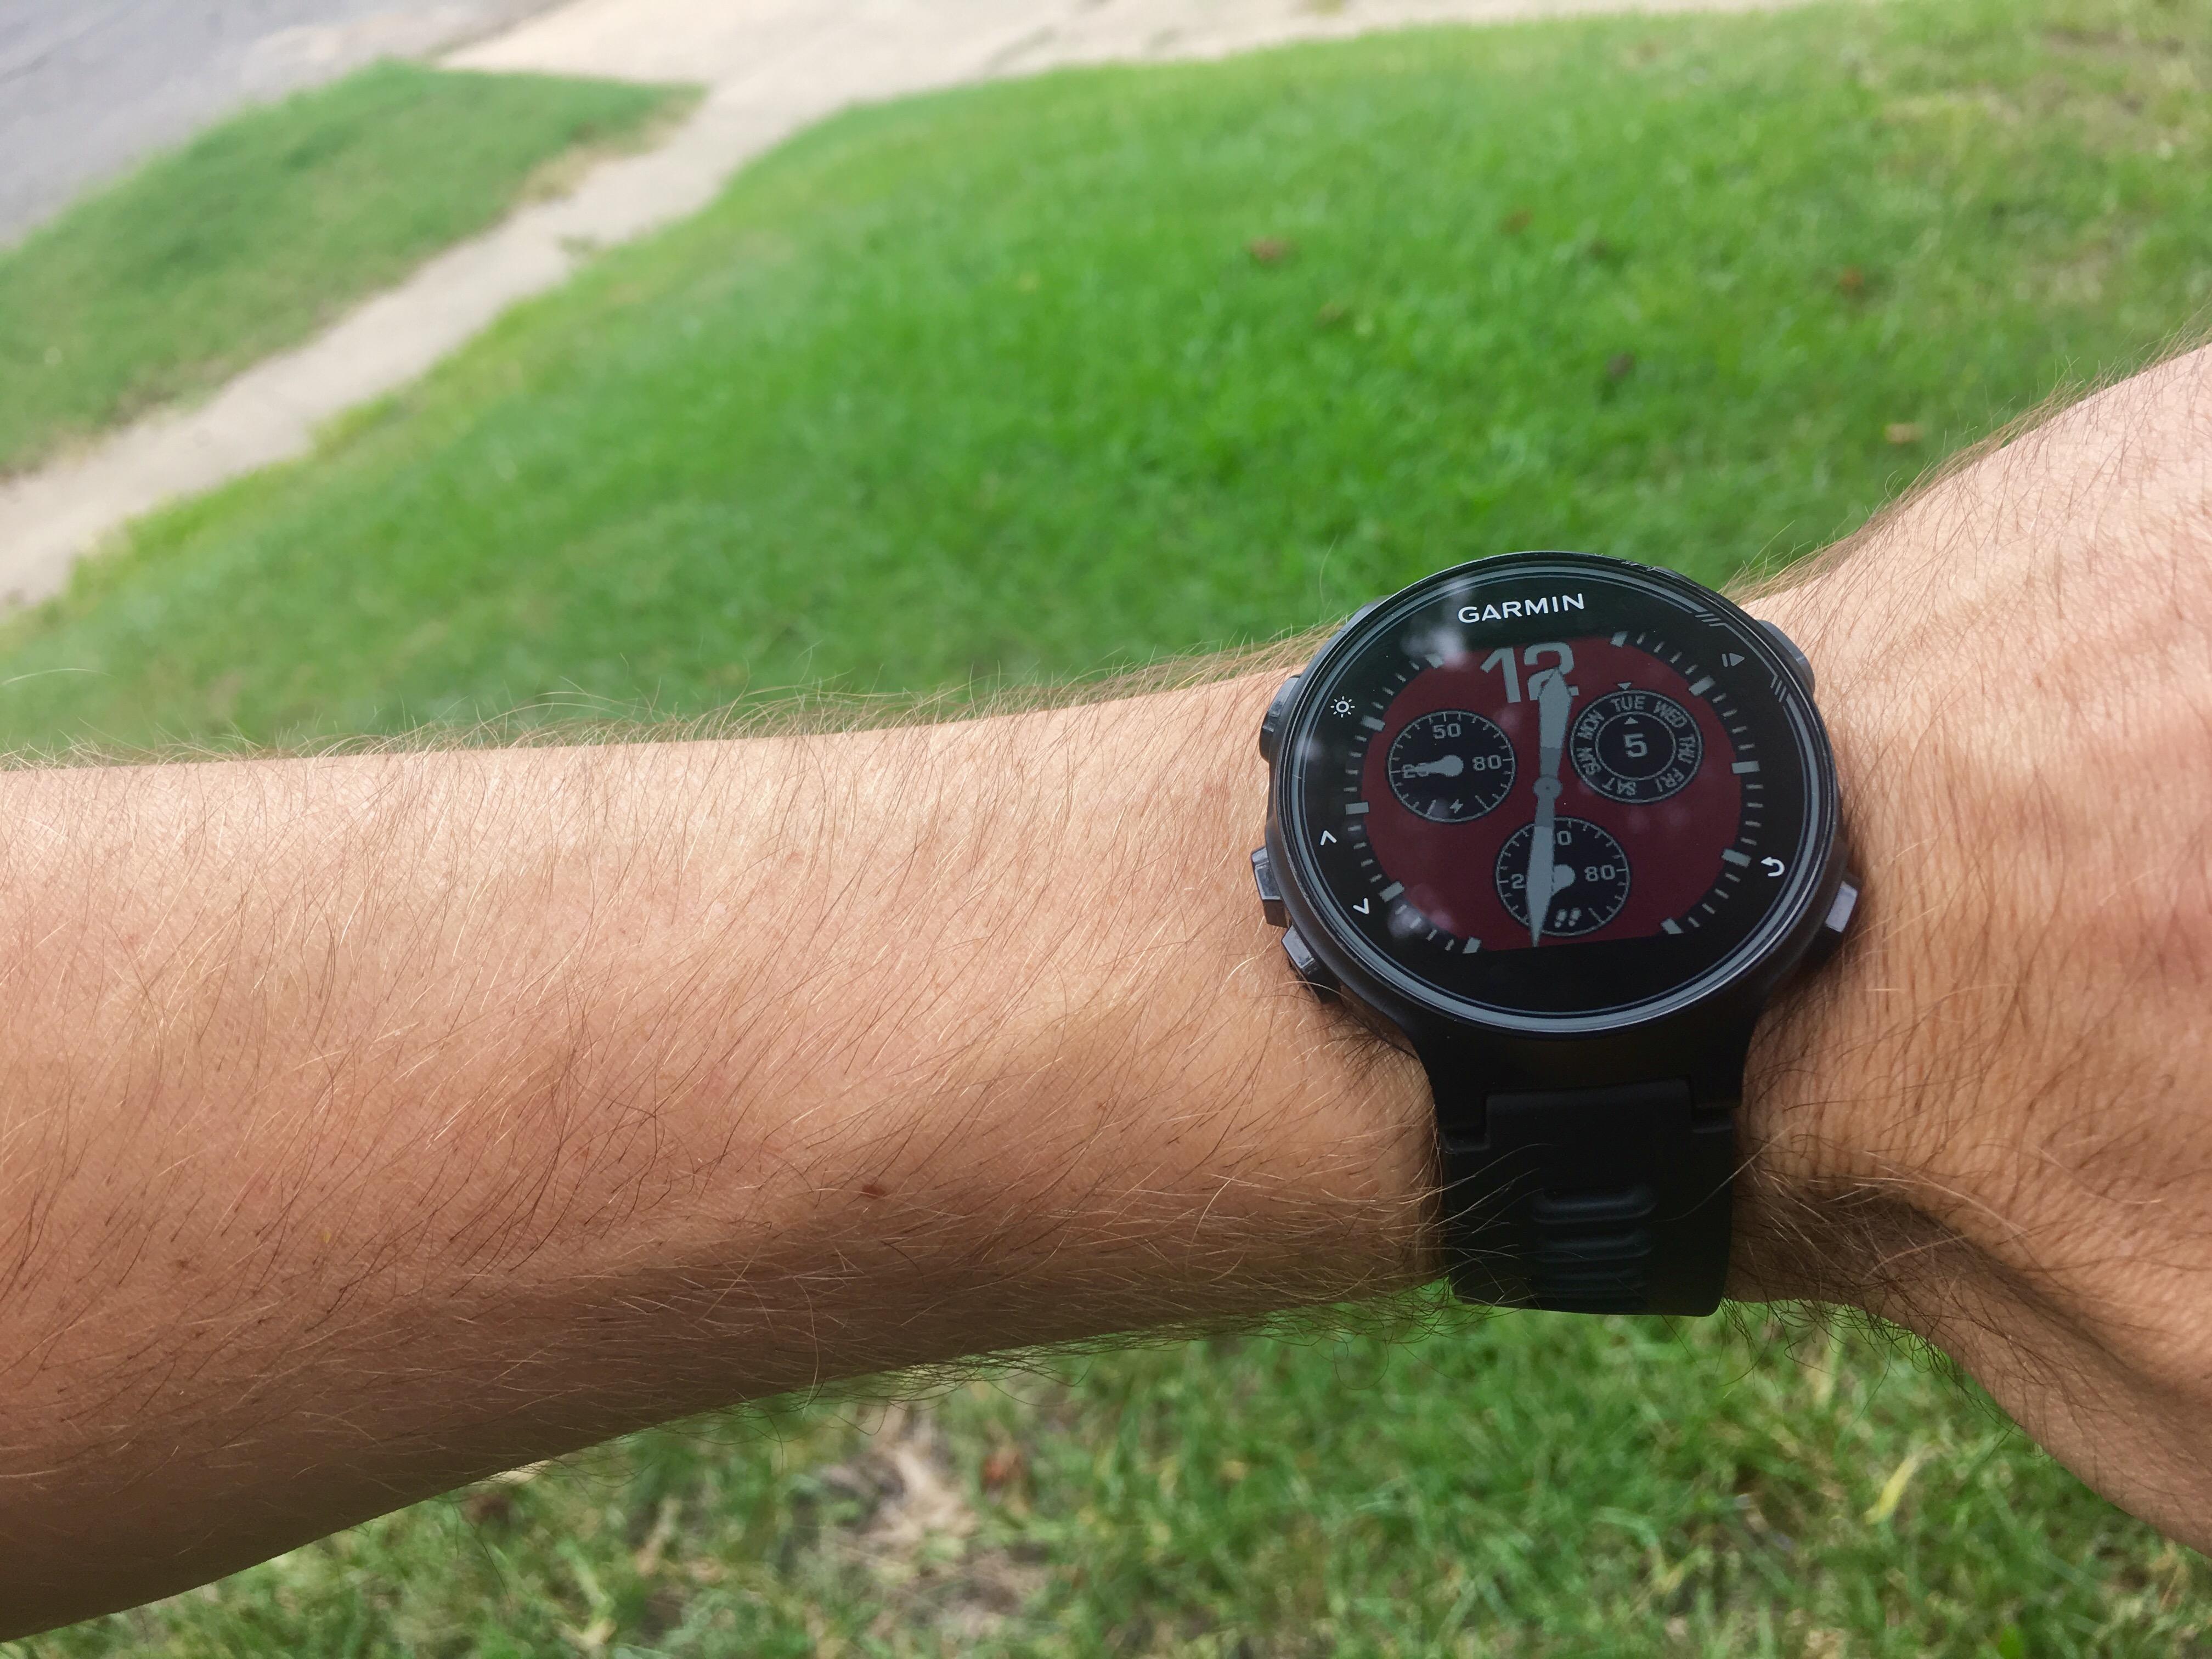 Garmin 735XT GPS watch